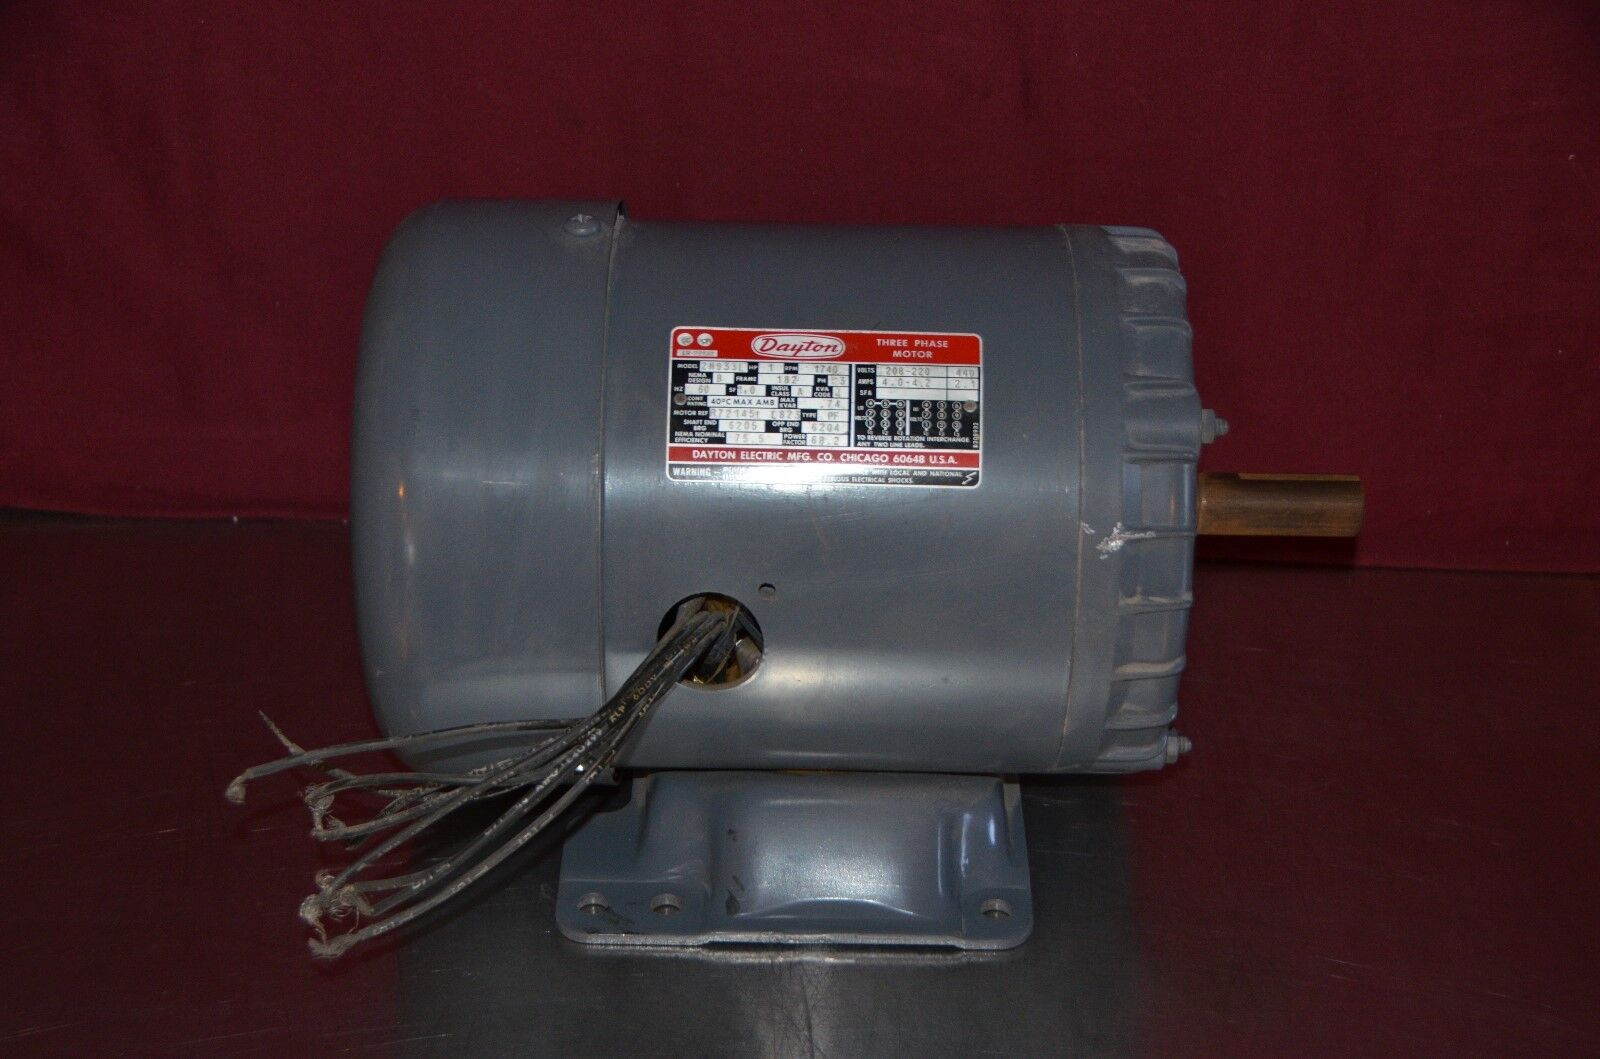 Dayton 2n933l 1 Hp 1740 Rpm 208 220 440v 3 Phase 60hz 182 Frame Motor Wiring Norton Secured Powered By Verisign